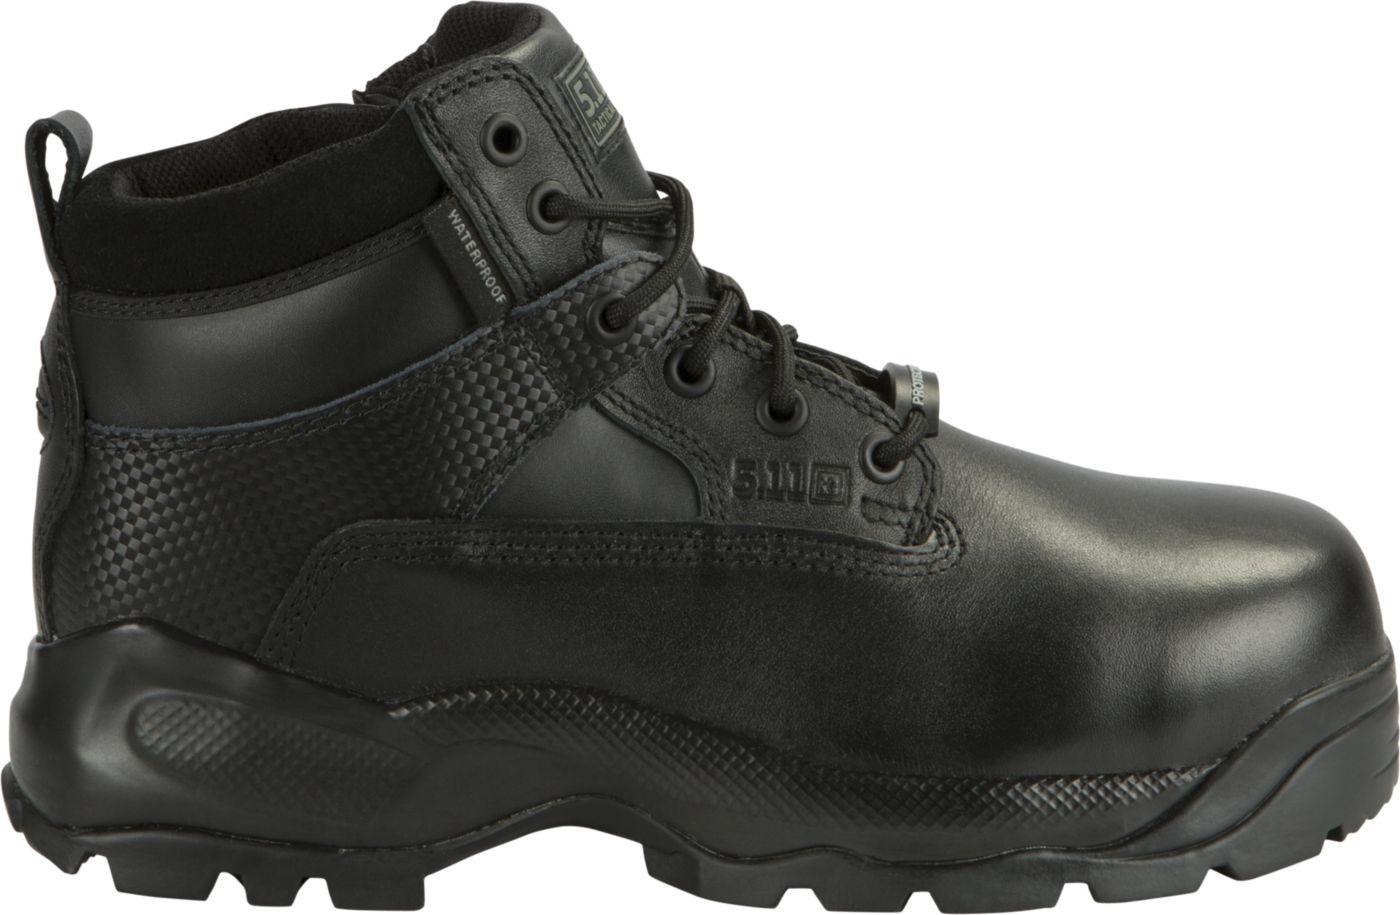 5.11 Tactical Men's A.T.A.C. Shield 6'' Side Zip Waterproof Tactical Boots